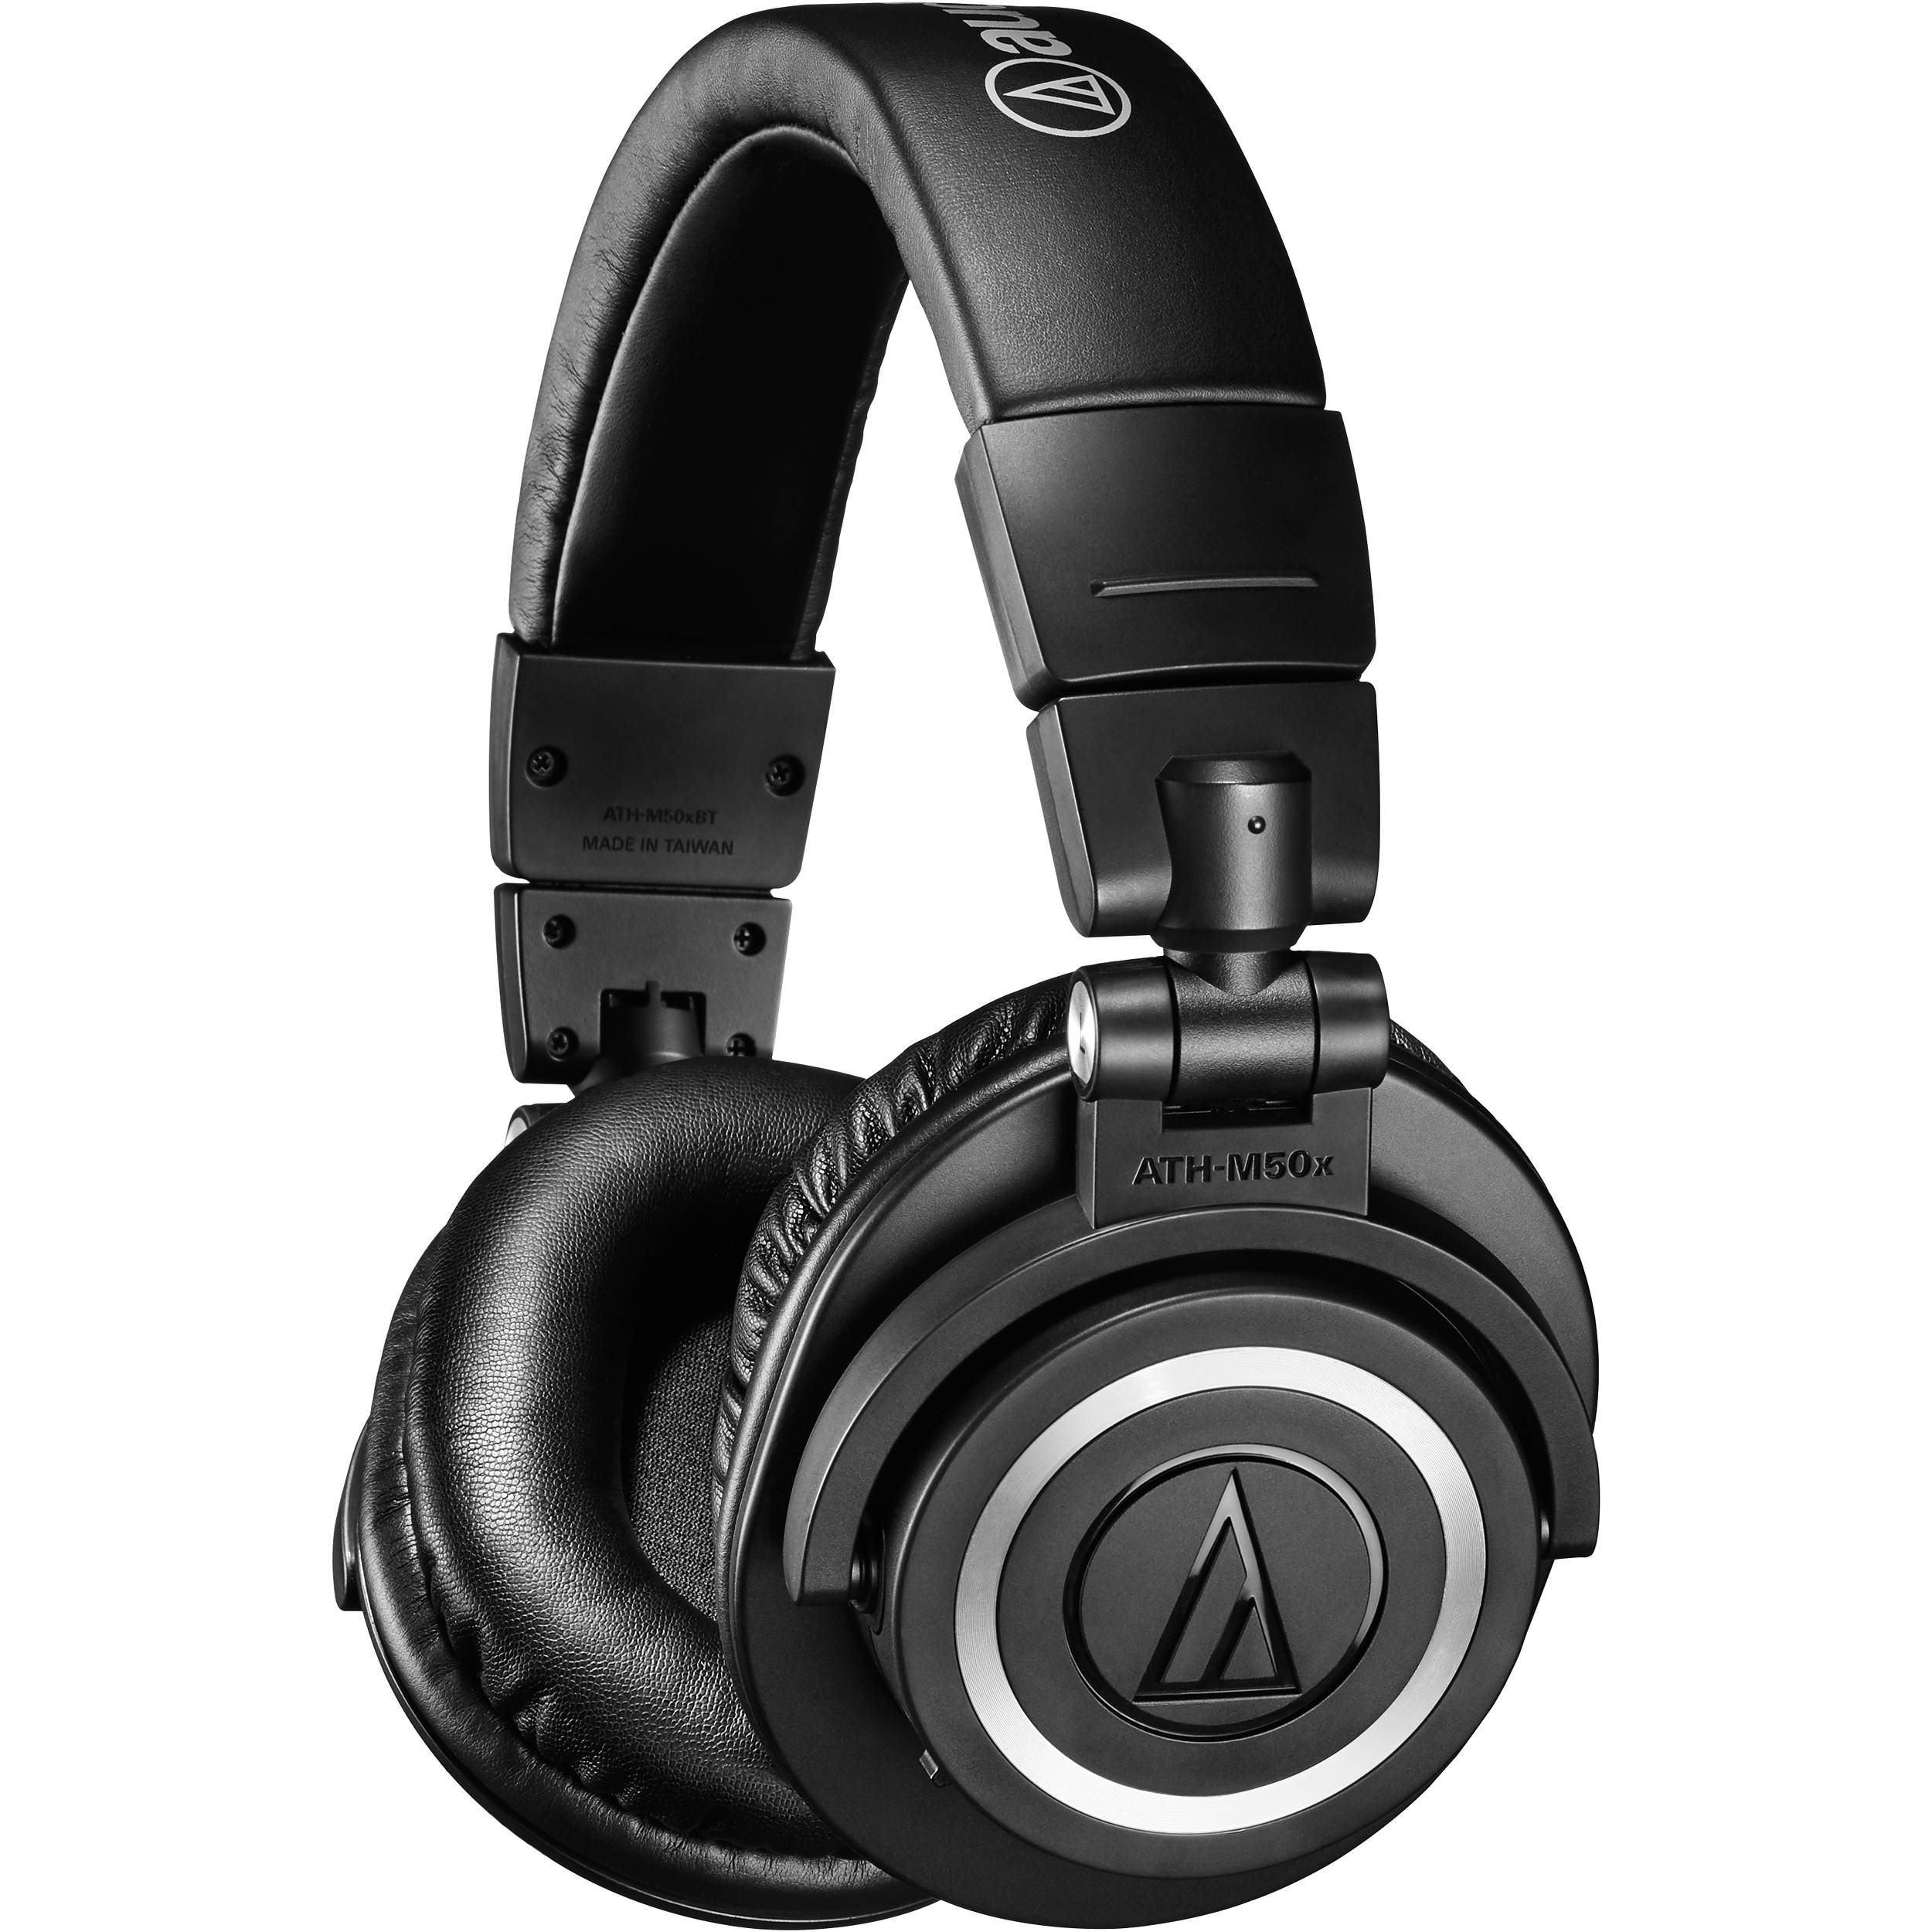 db86a4b745e Audio-Technica Consumer ATH-M50xBT Wireless Over-Ear ATH-M50XBT